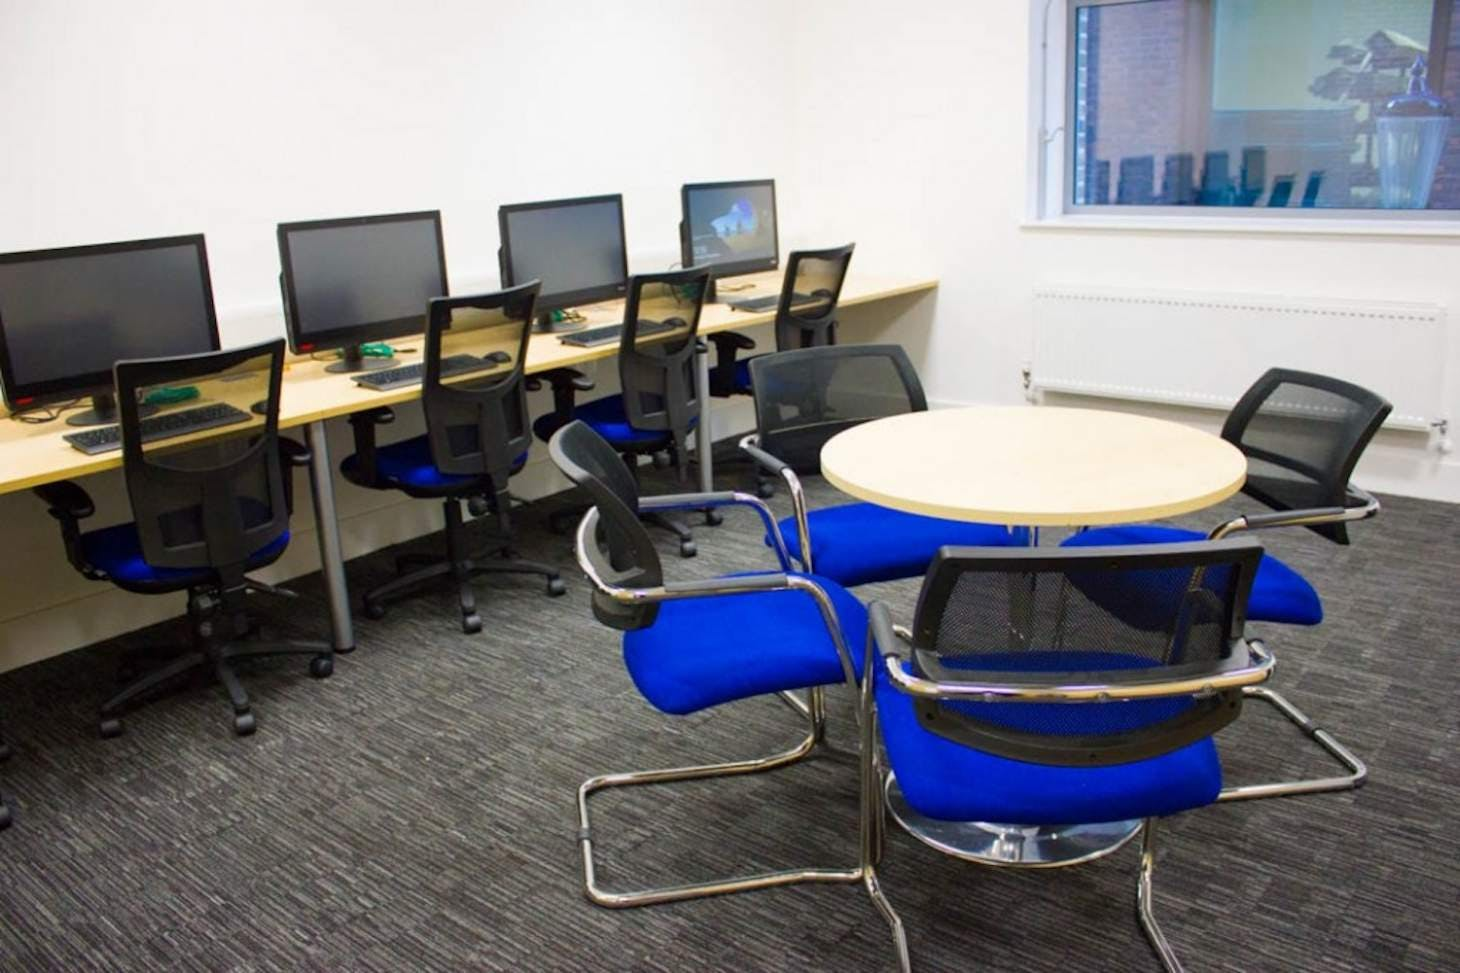 Marlborough Primary School IT room space hire